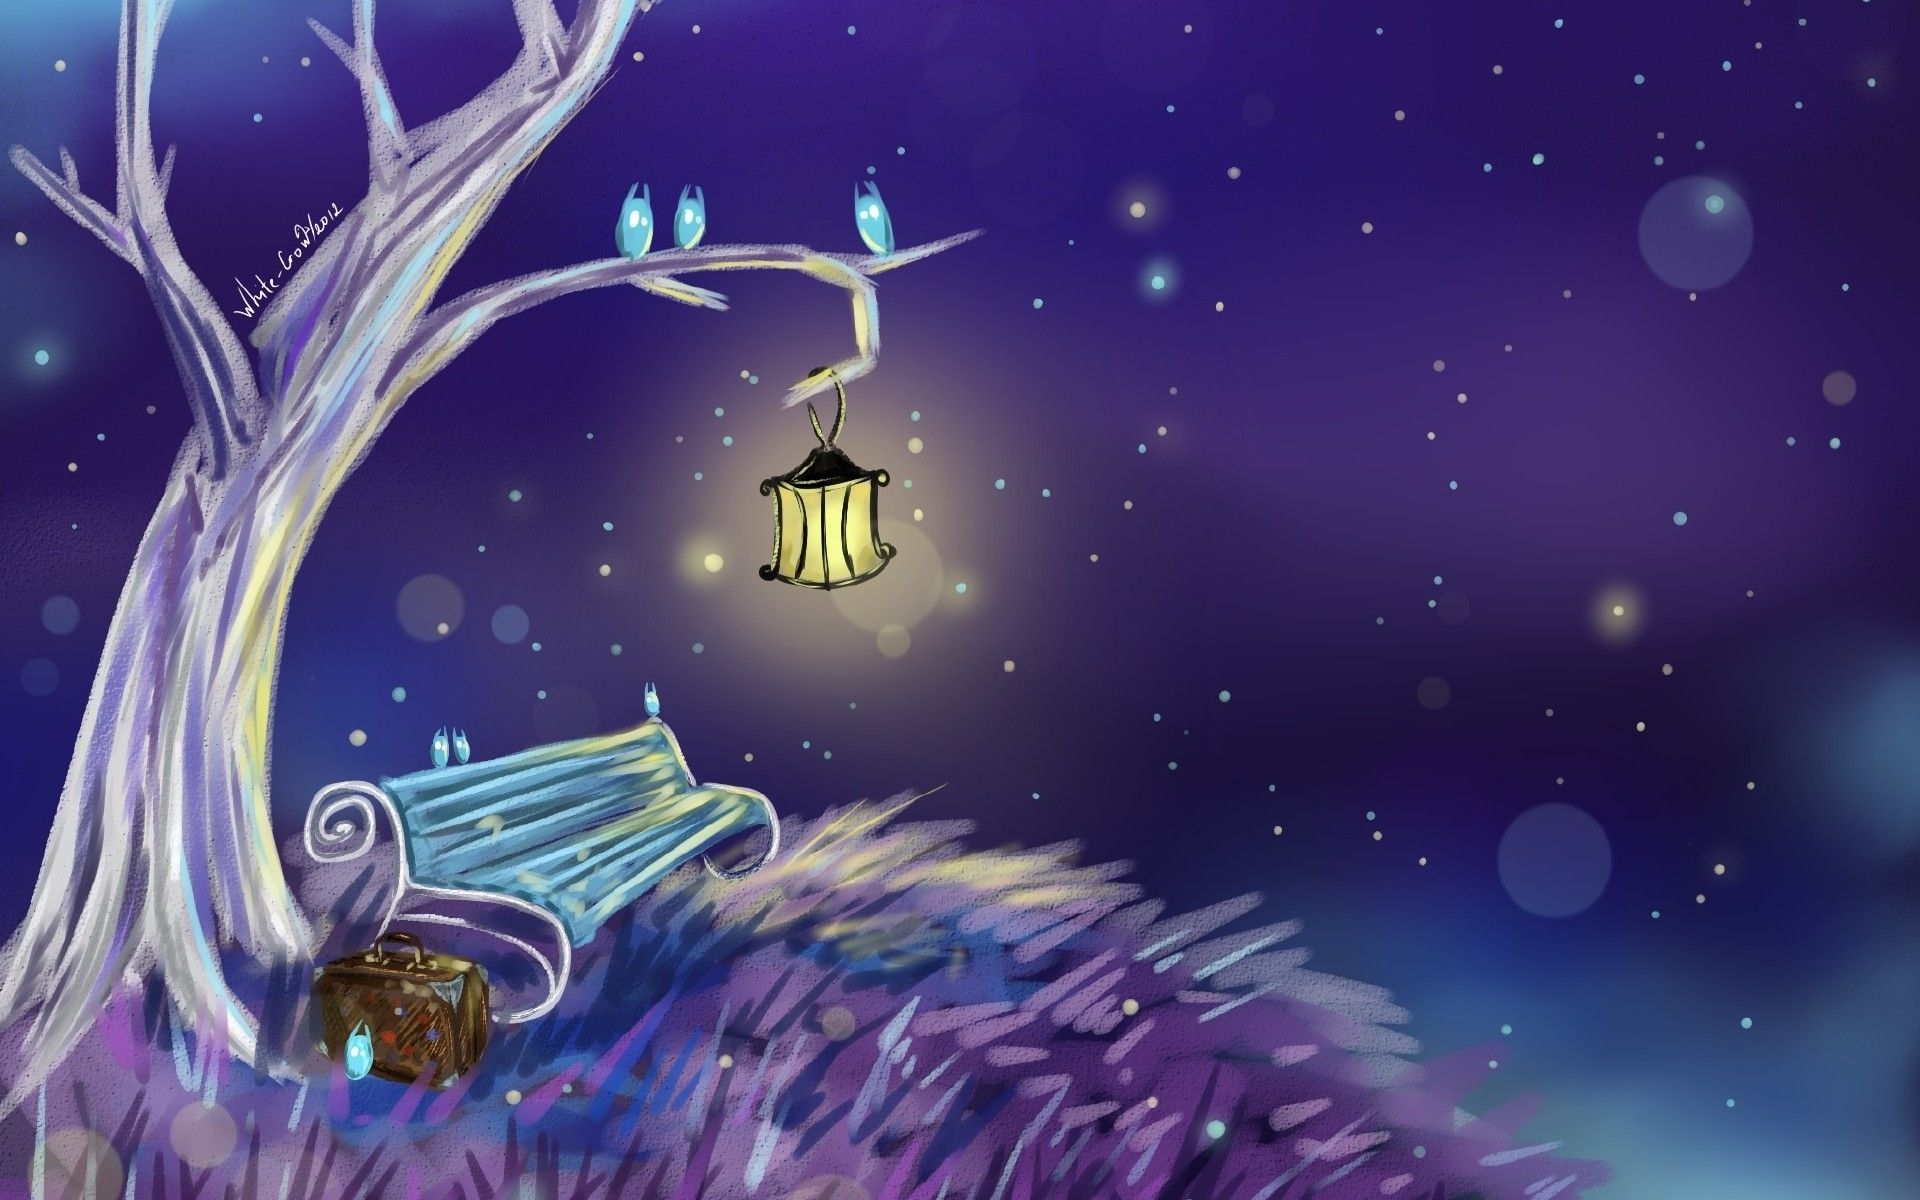 Magical World Fantasy Art Painting Wallpaper Hd For Desktop